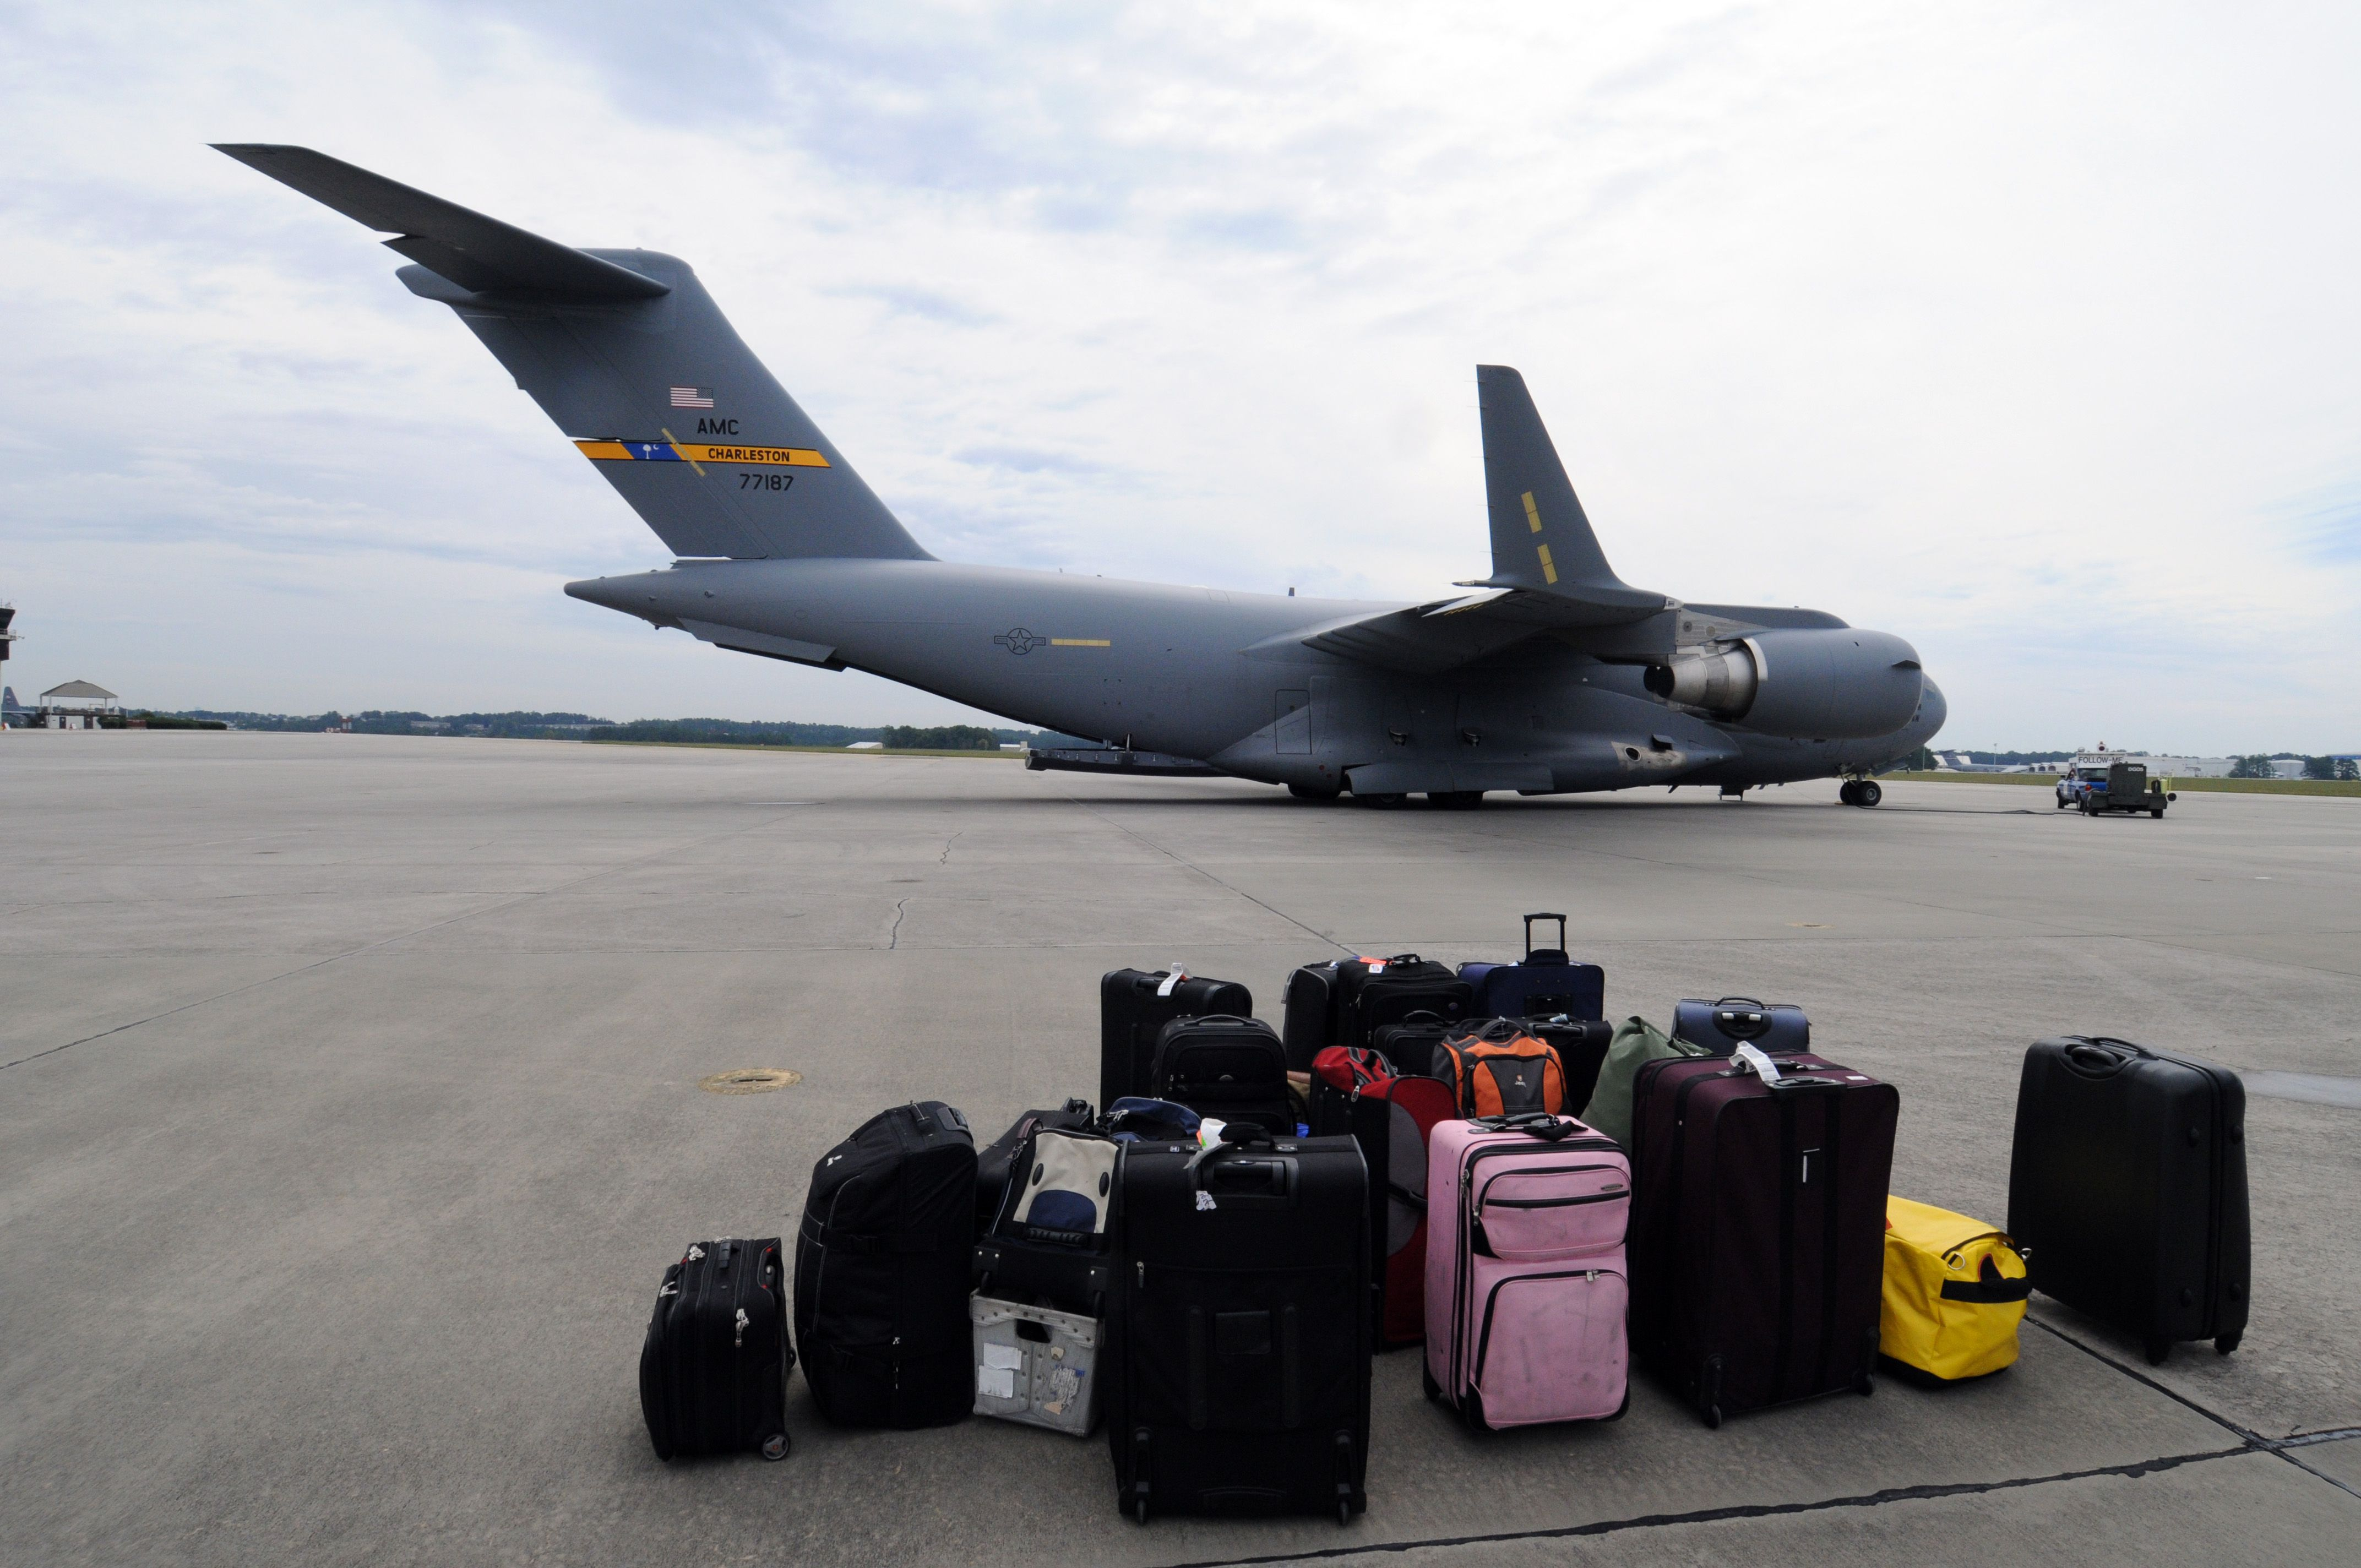 Samsung et Samsonite travaillent sur des valises